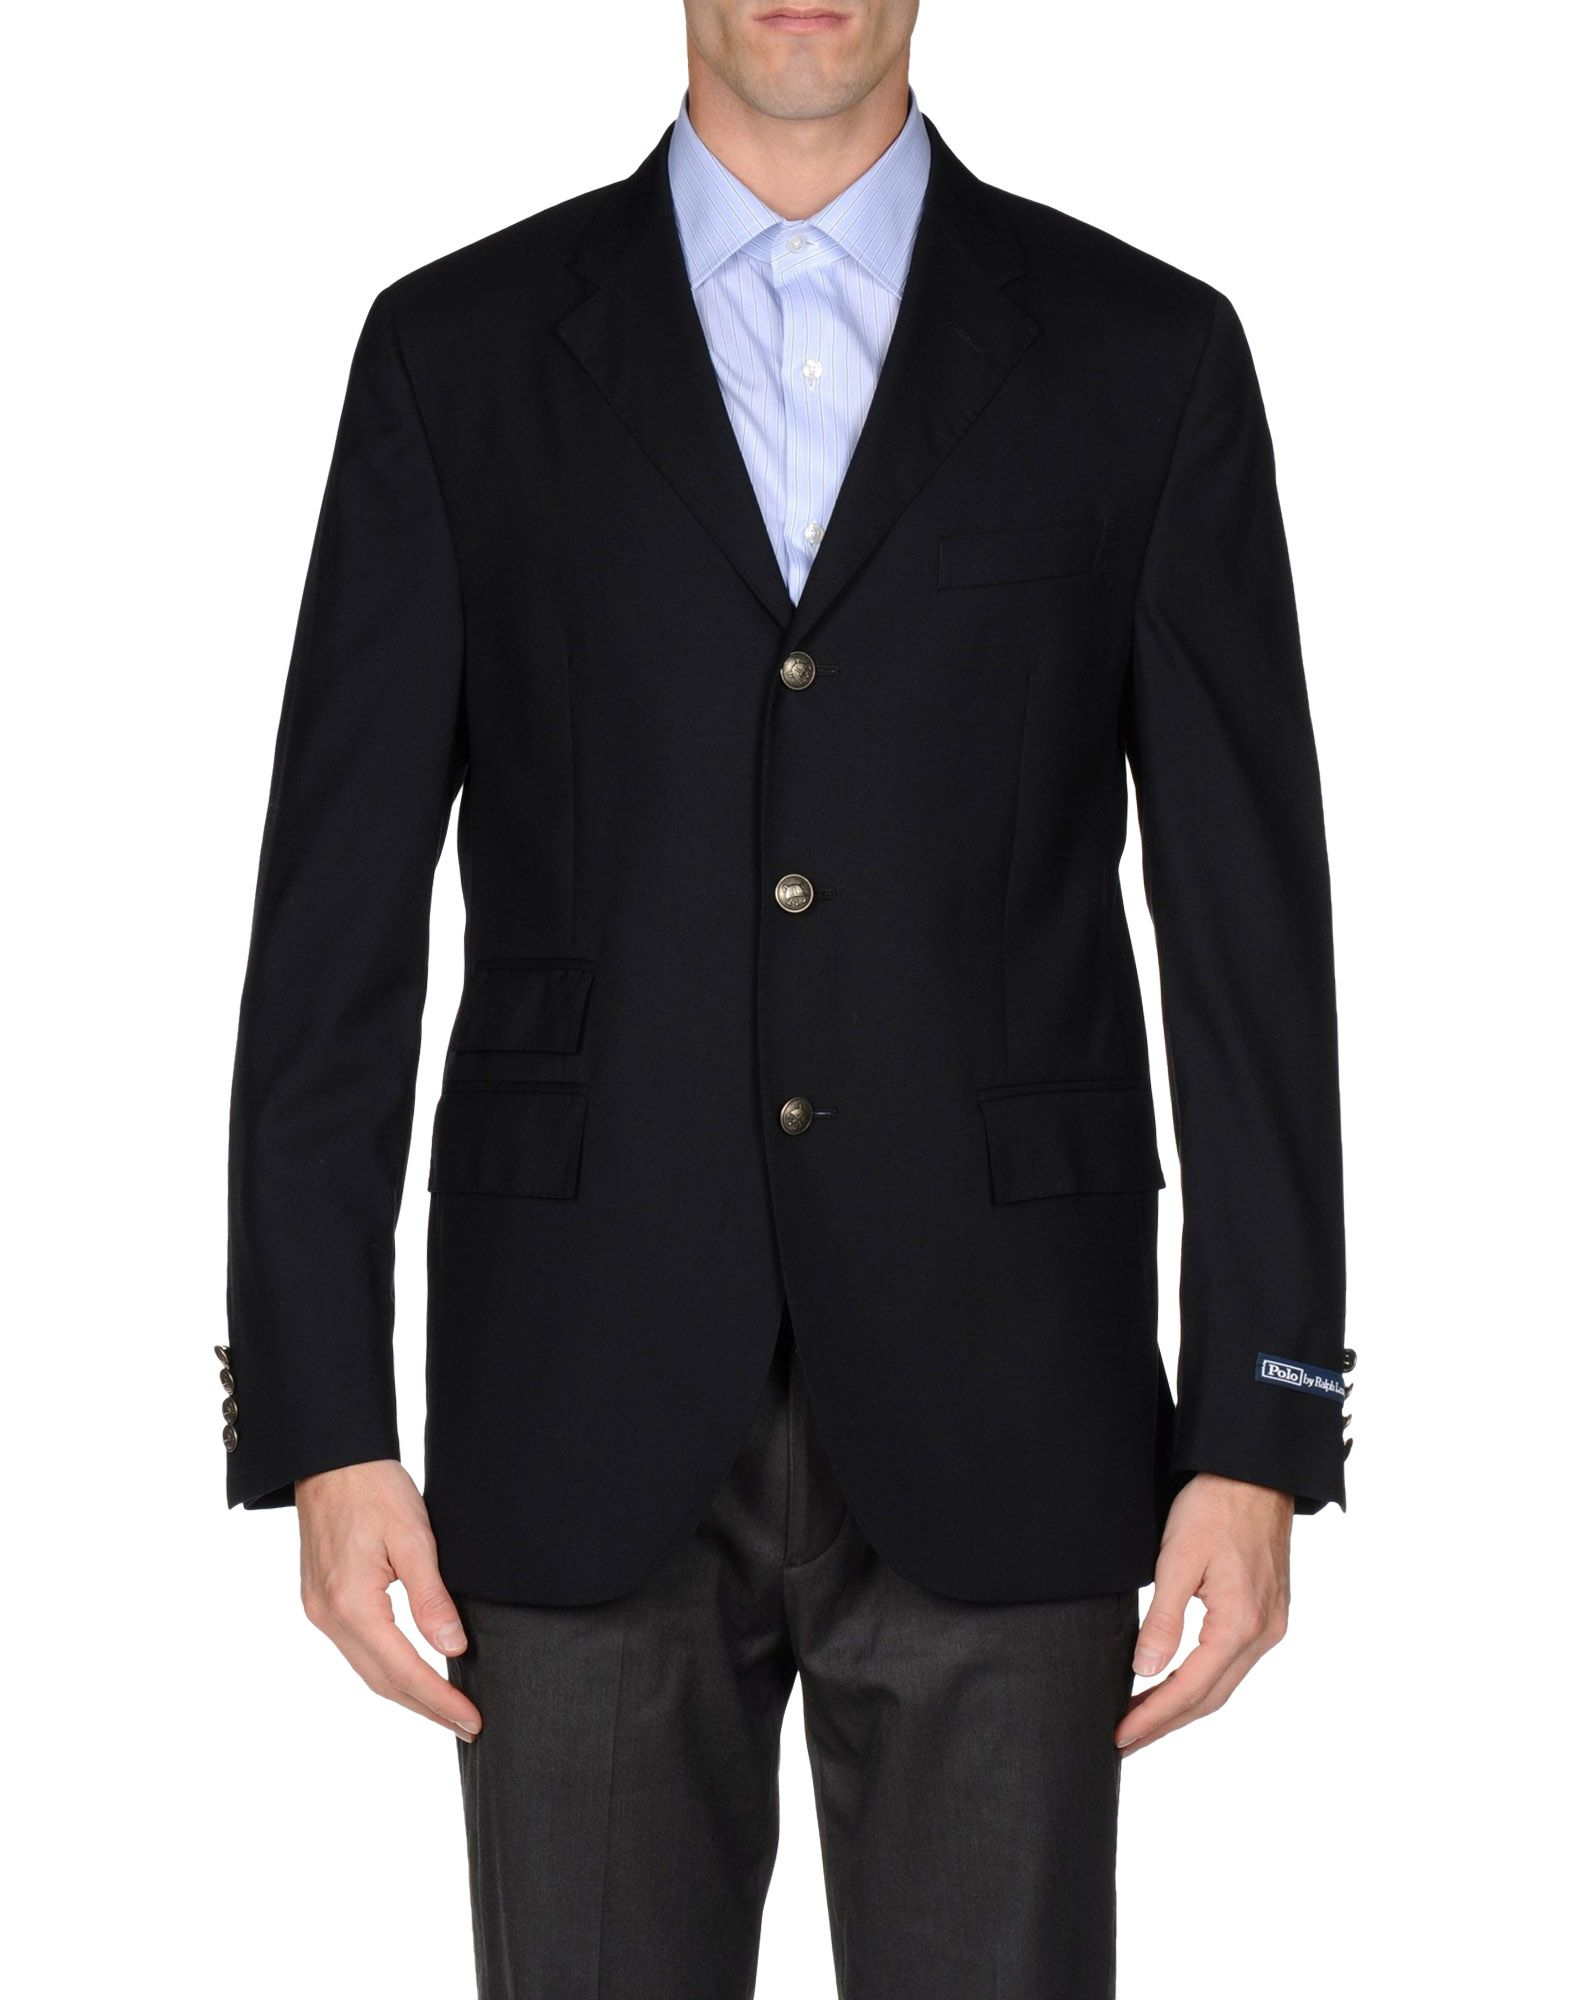 polo ralph lauren blazer in black for men dark blue lyst. Black Bedroom Furniture Sets. Home Design Ideas